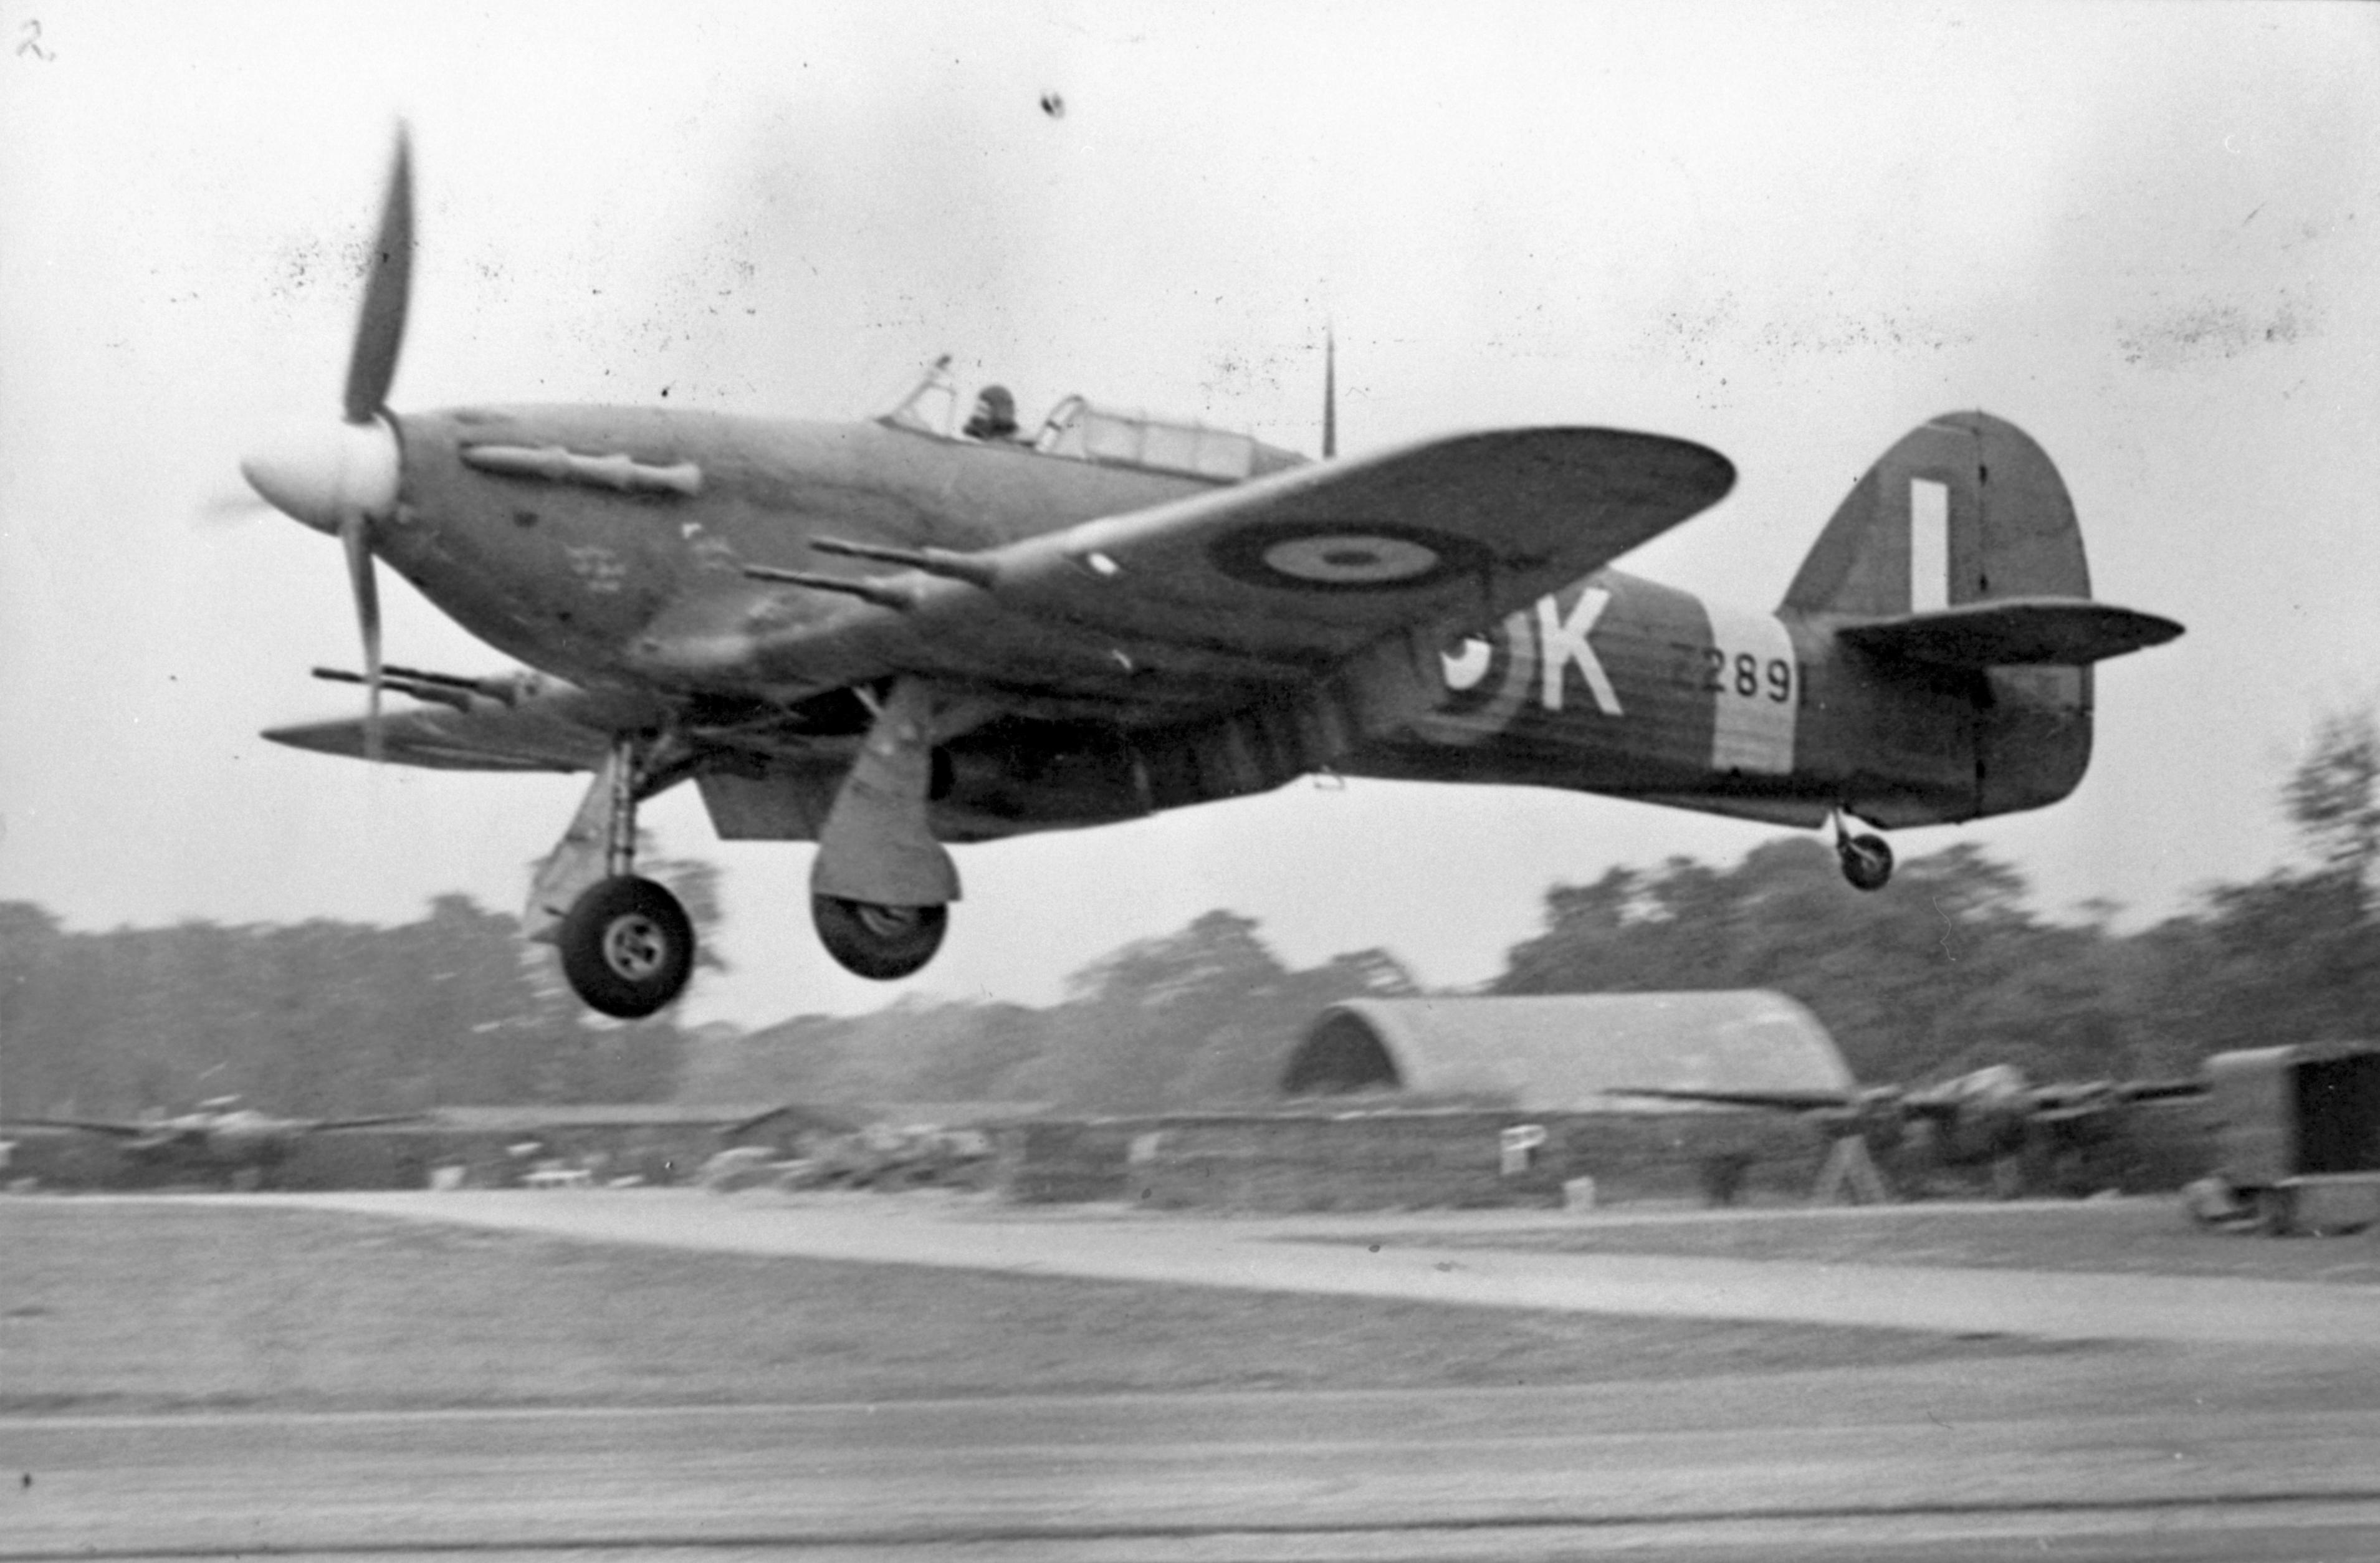 Hurricane IIb Z2891 landing at RAF Station Hunsden 01